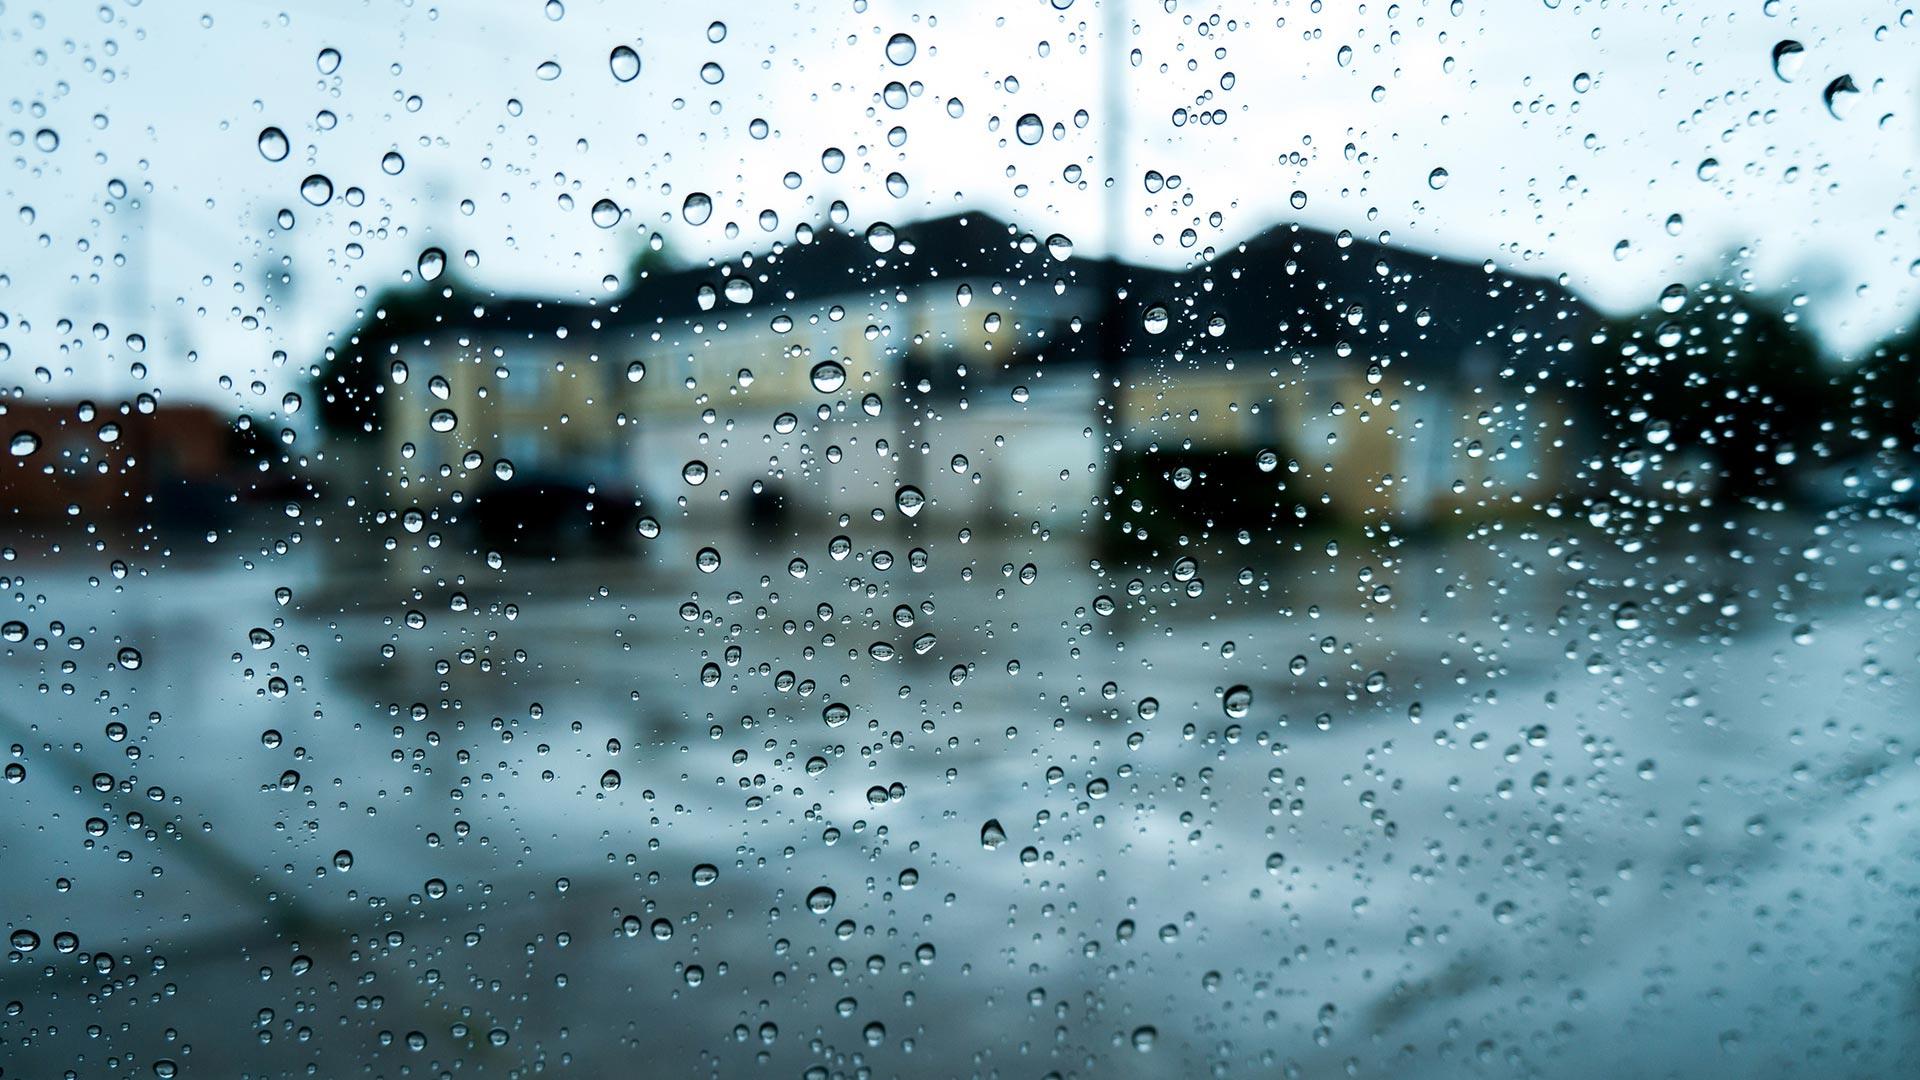 Rain theme for windows 10 8 7 - Rainy hd wallpaper for pc ...